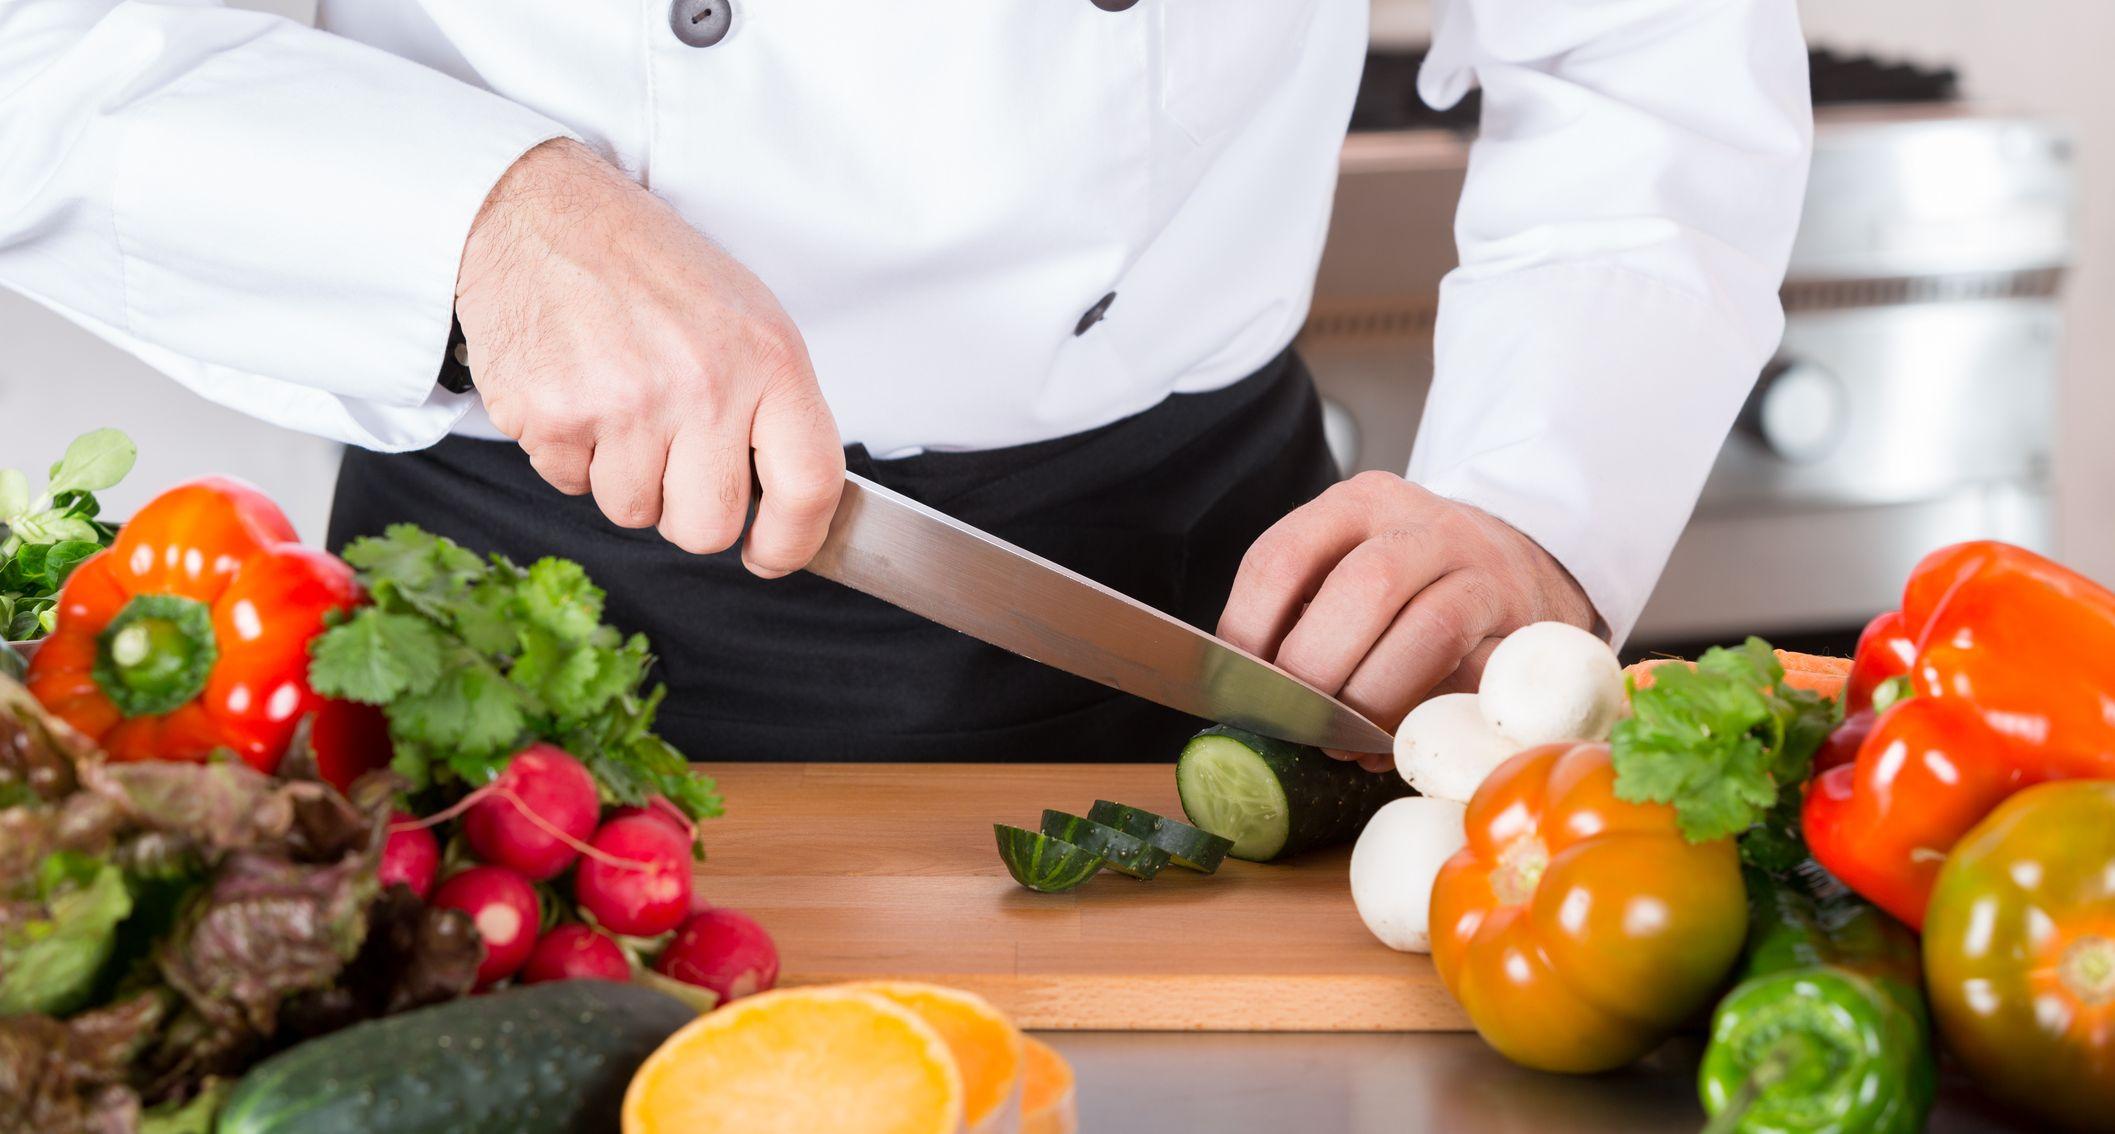 Messertricks Aramark Koch schneidet Gemüse